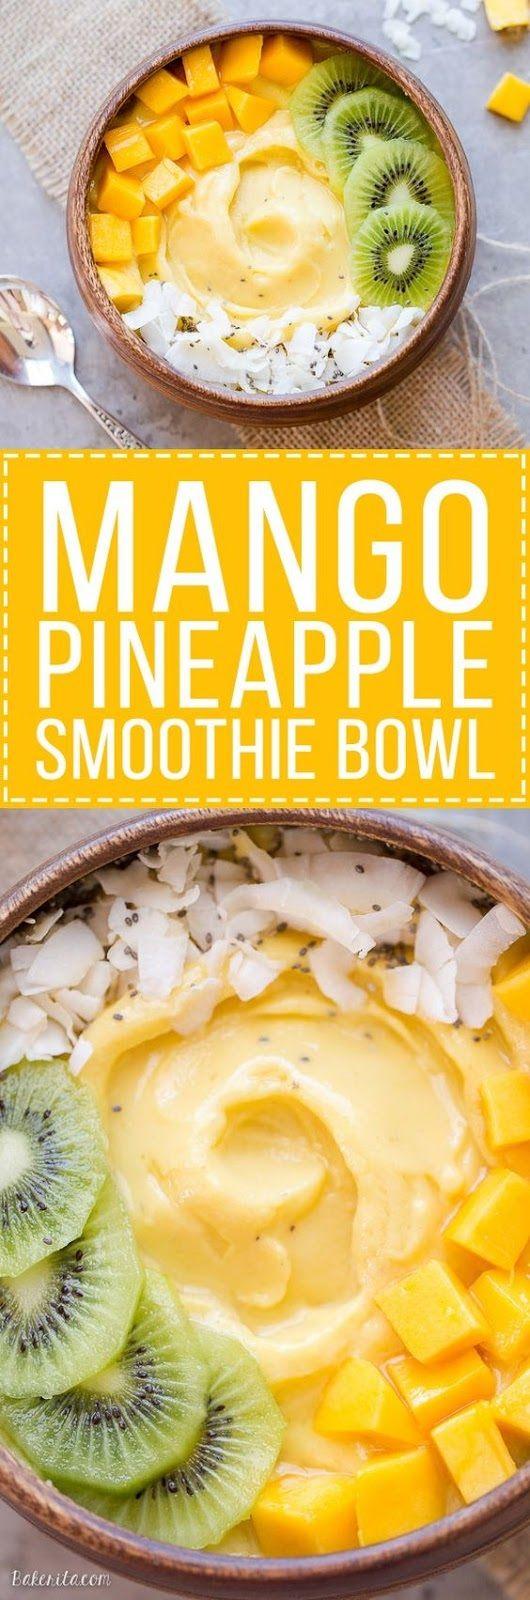 Pineapple Mango Smoothie Bowl